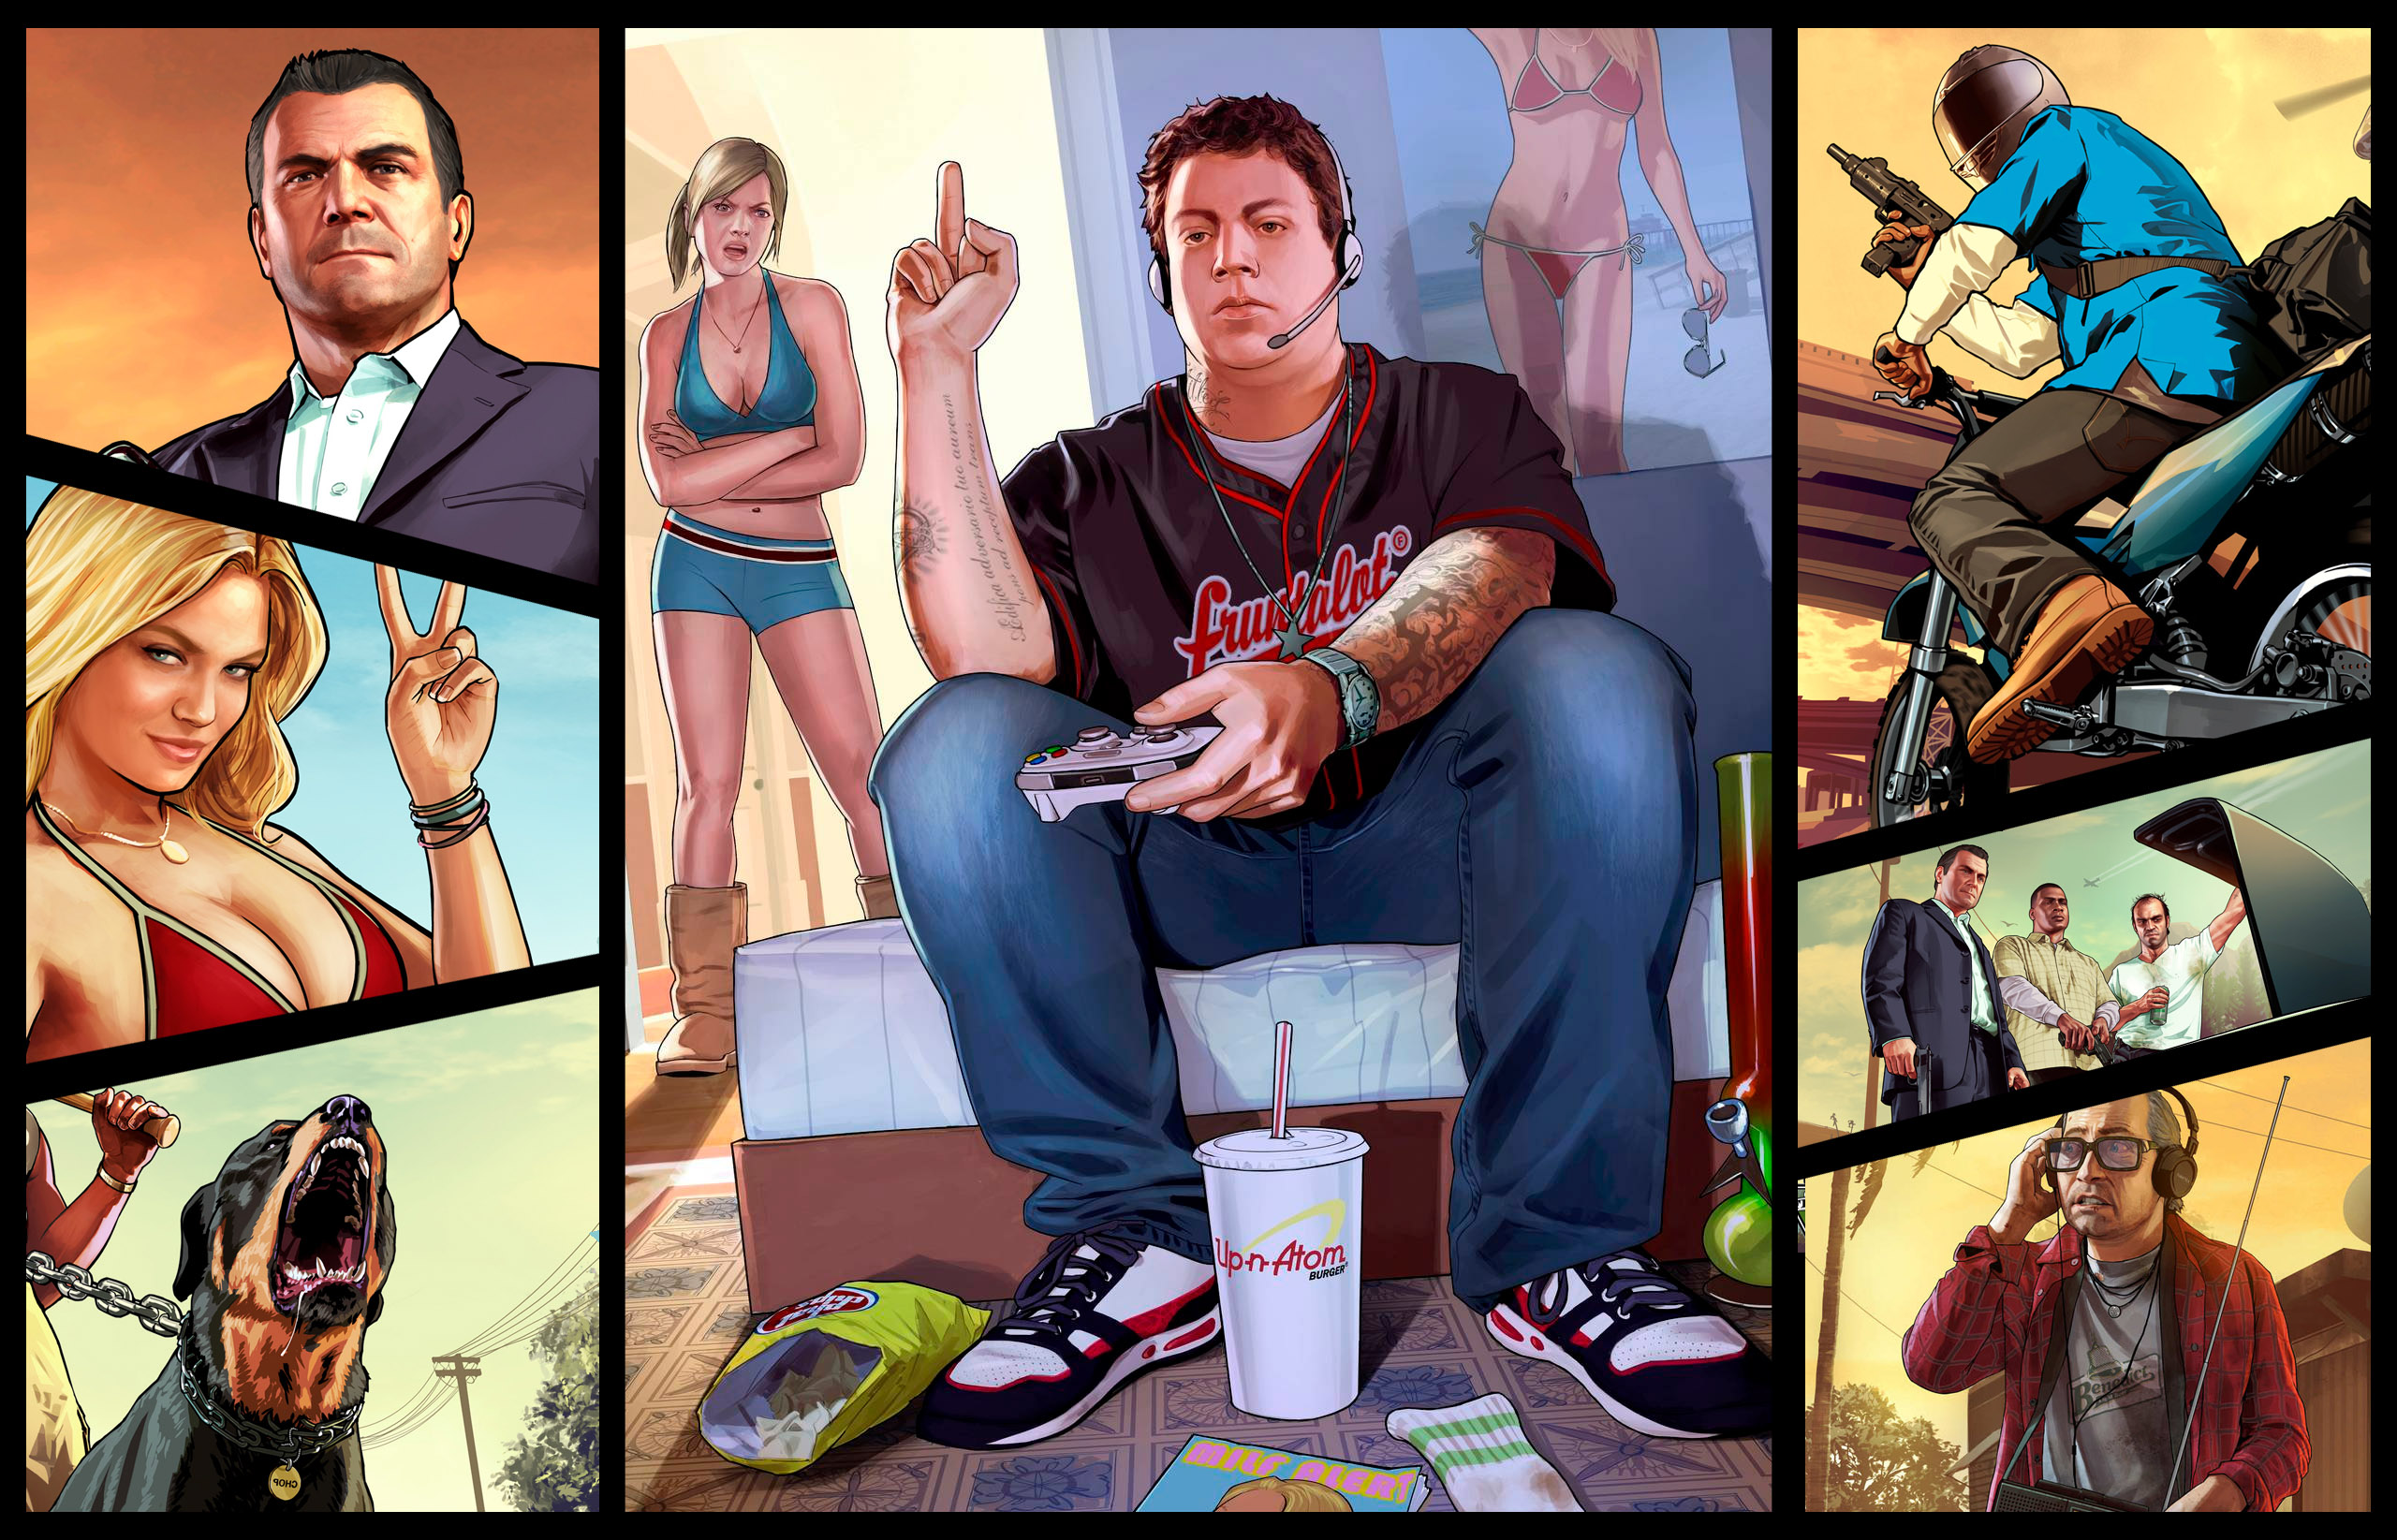 Grand Theft Auto V Wallpaper Youtube Channel Art Professional 2560x1645